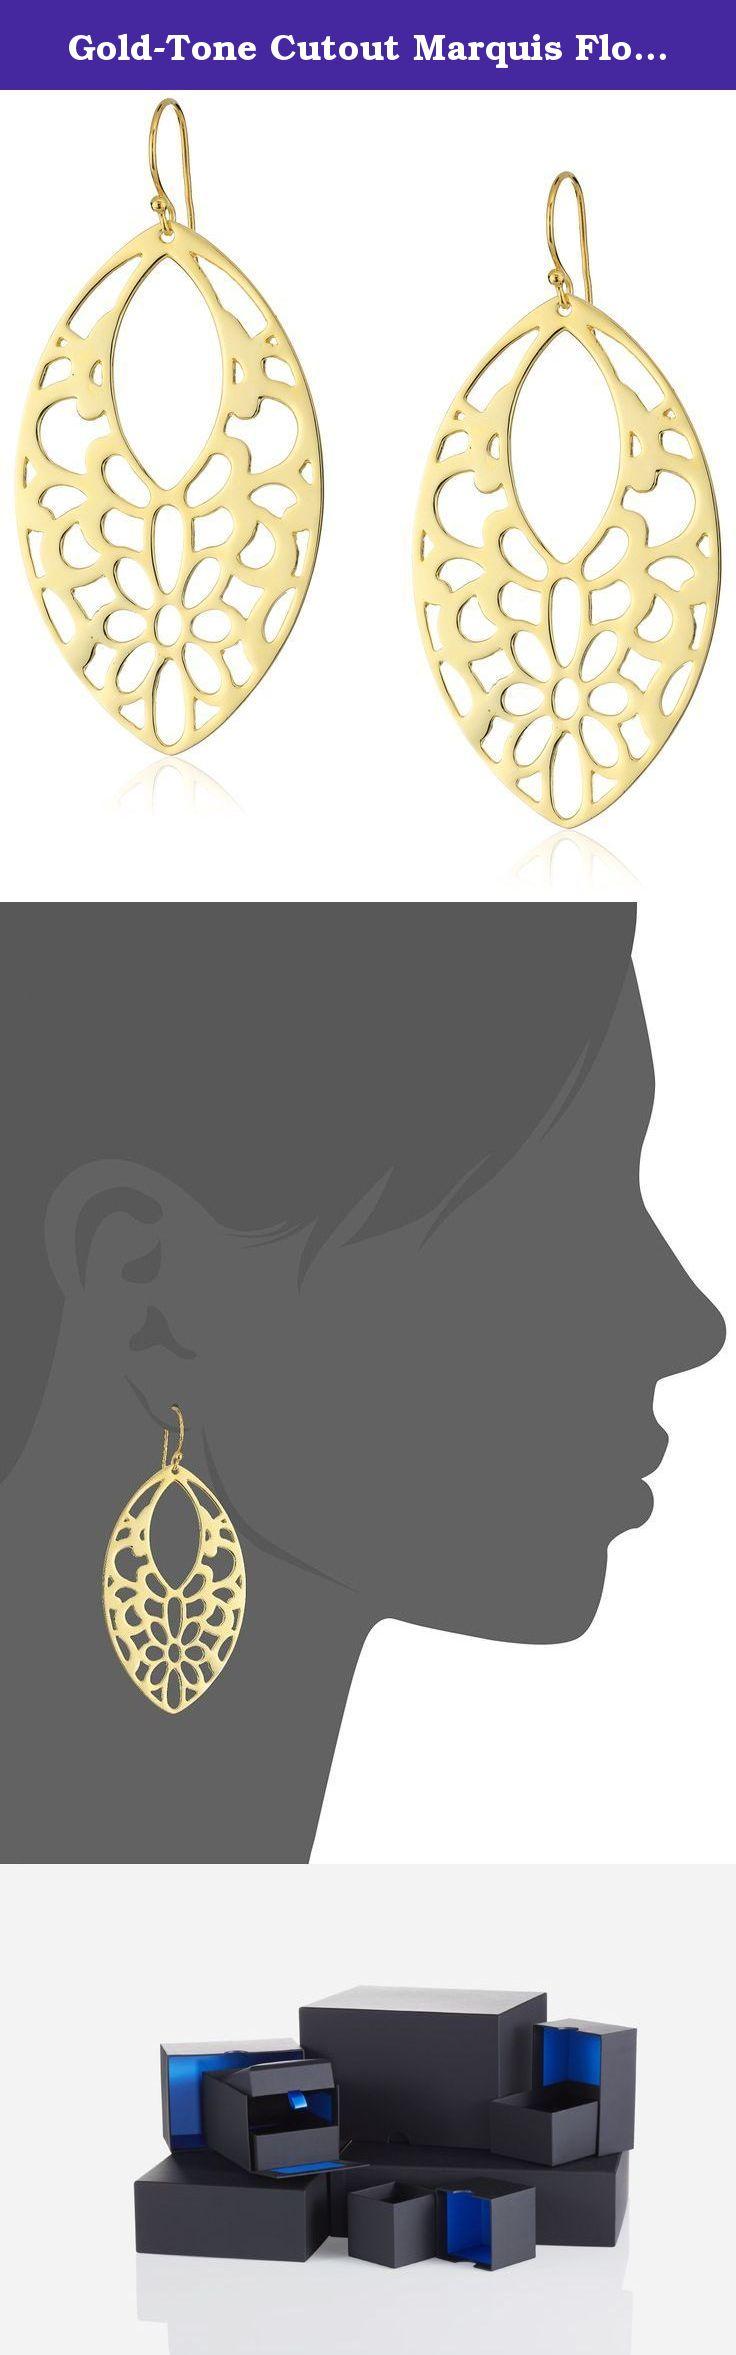 Gold-Tone Cutout Marquis Flower Drop Earrings. Gold-tone earrings in marquis shape featuring floral cutouts. Fishhook closure. Imported.